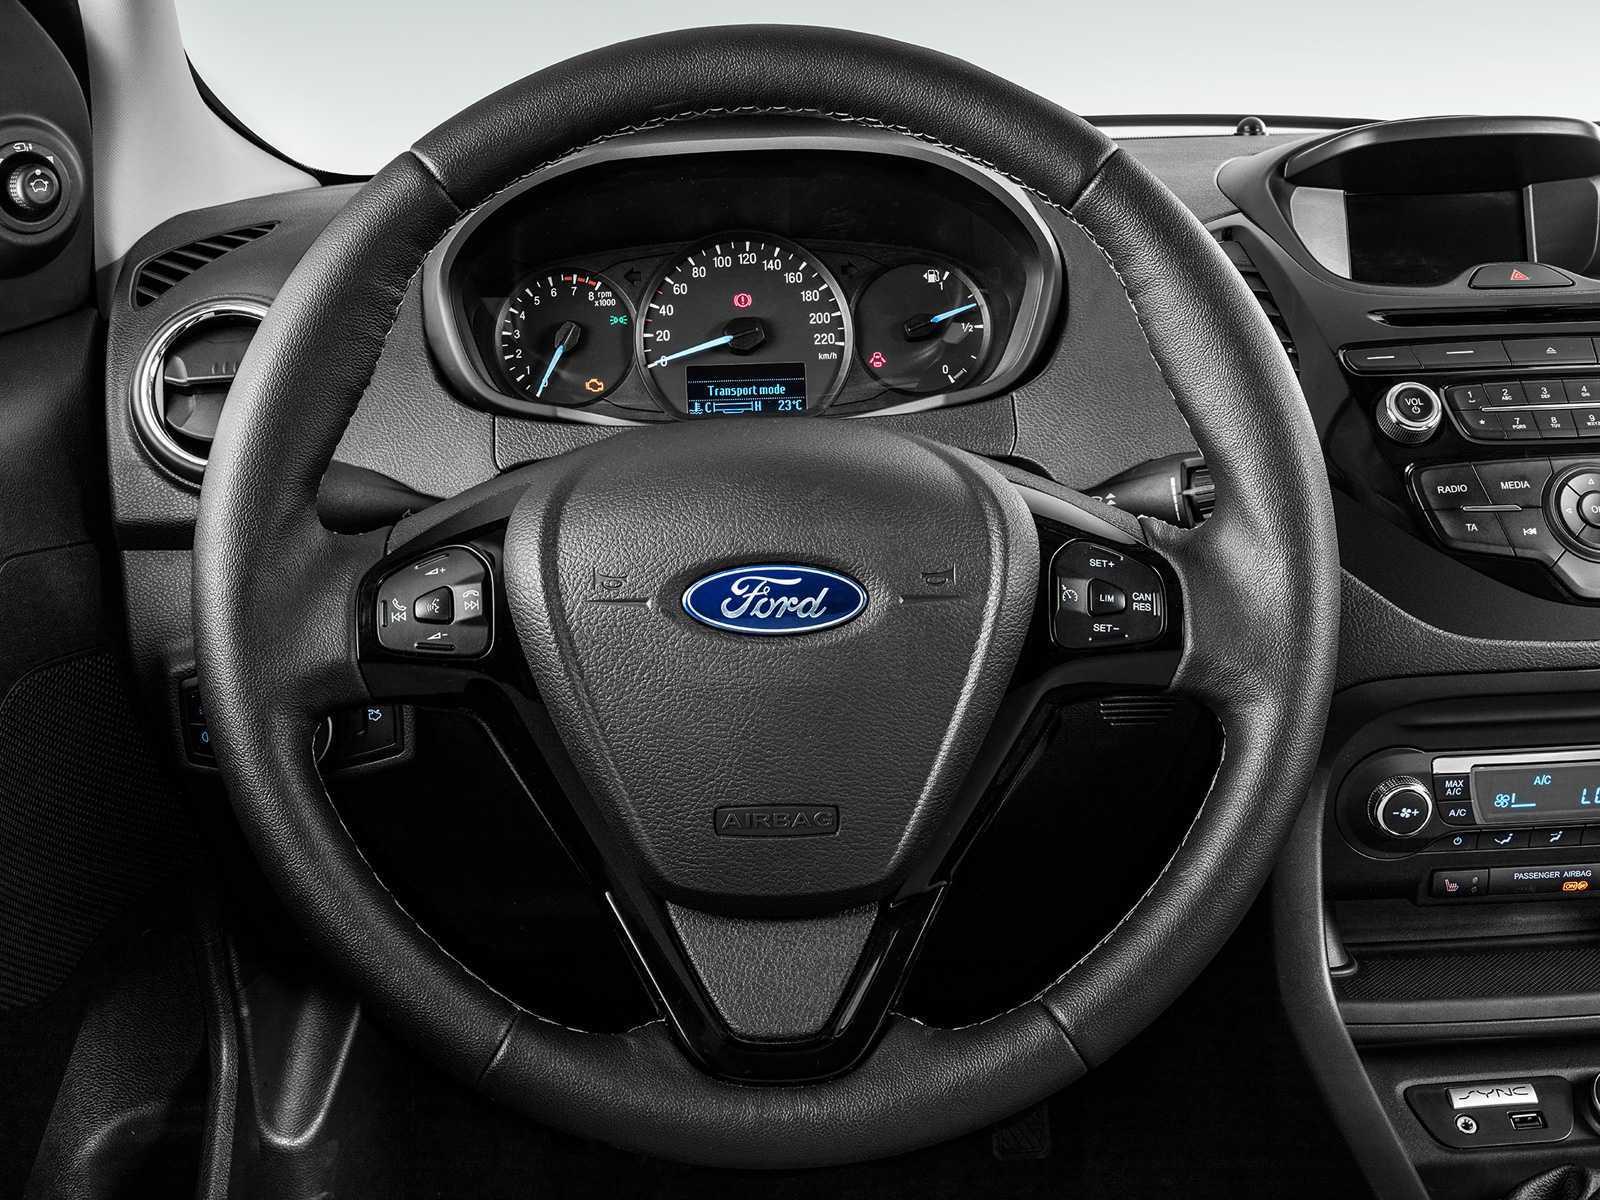 FordKa 2017 - volante